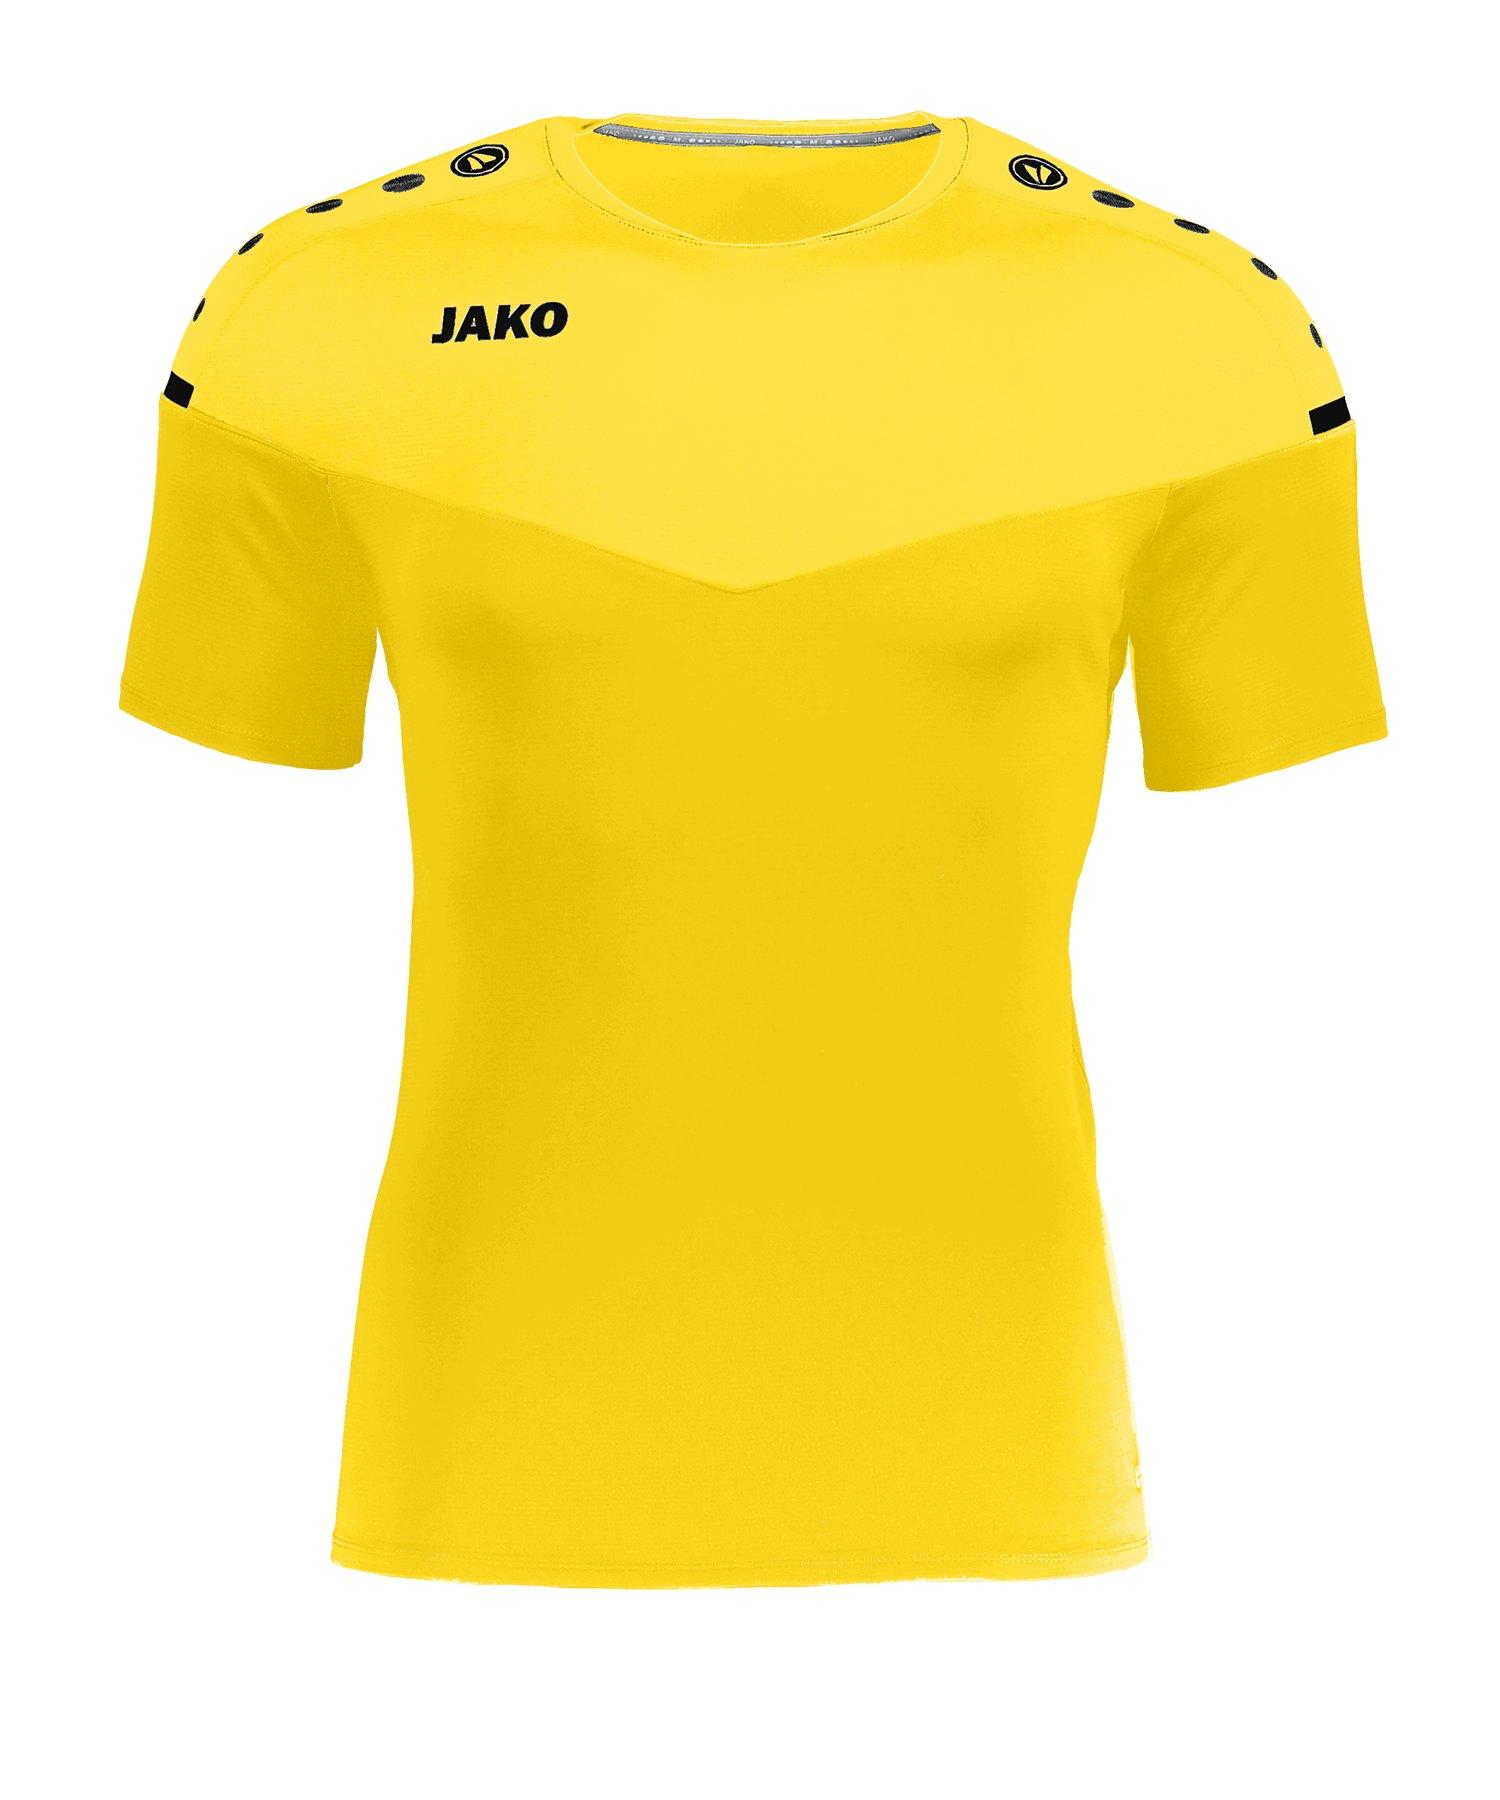 Jako Champ 2.0 T-Shirt Gelb F03 - gelb